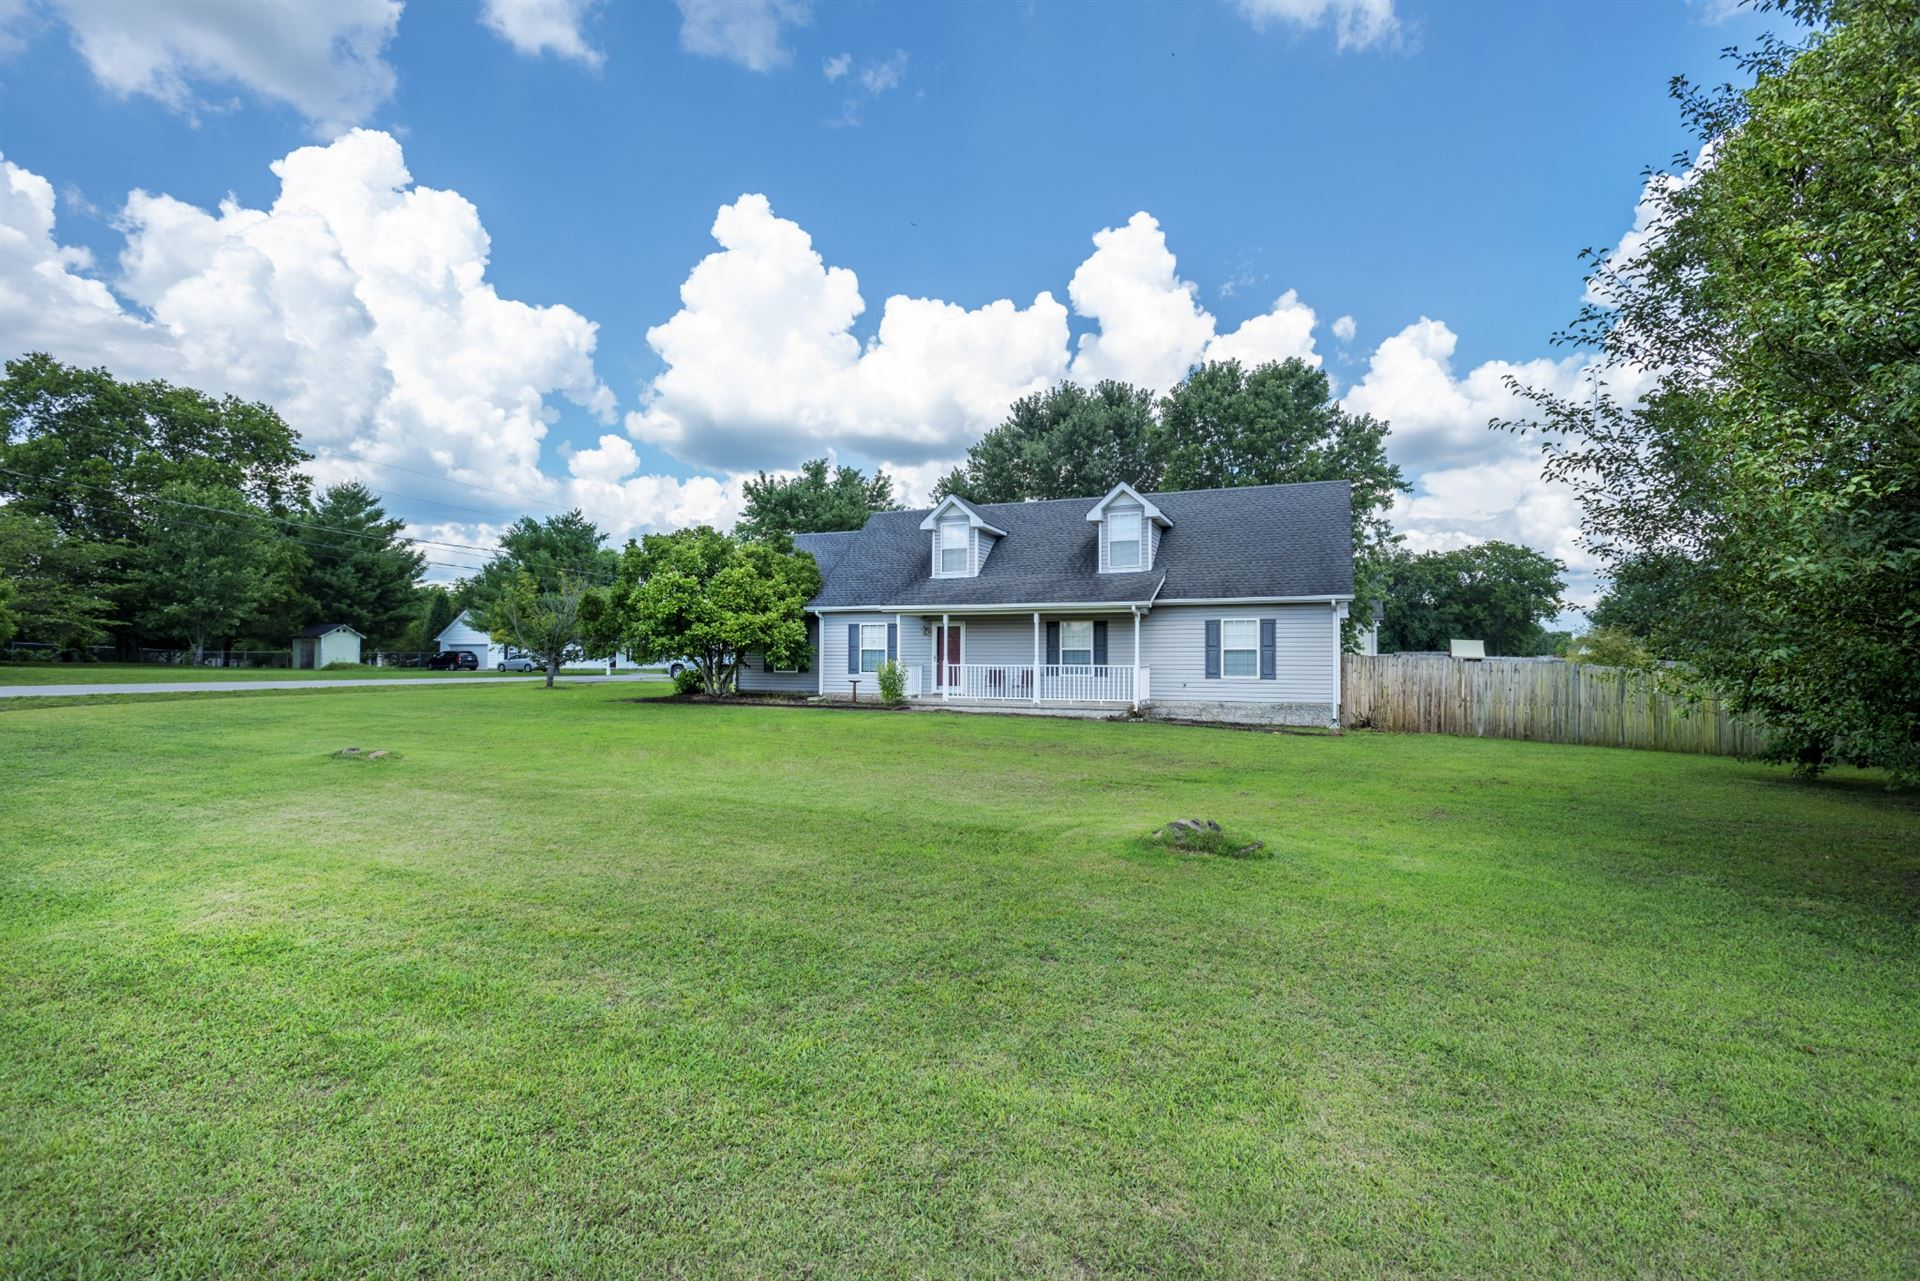 Photo of 116 Wears Dr, Murfreesboro, TN 37128 (MLS # 2167995)